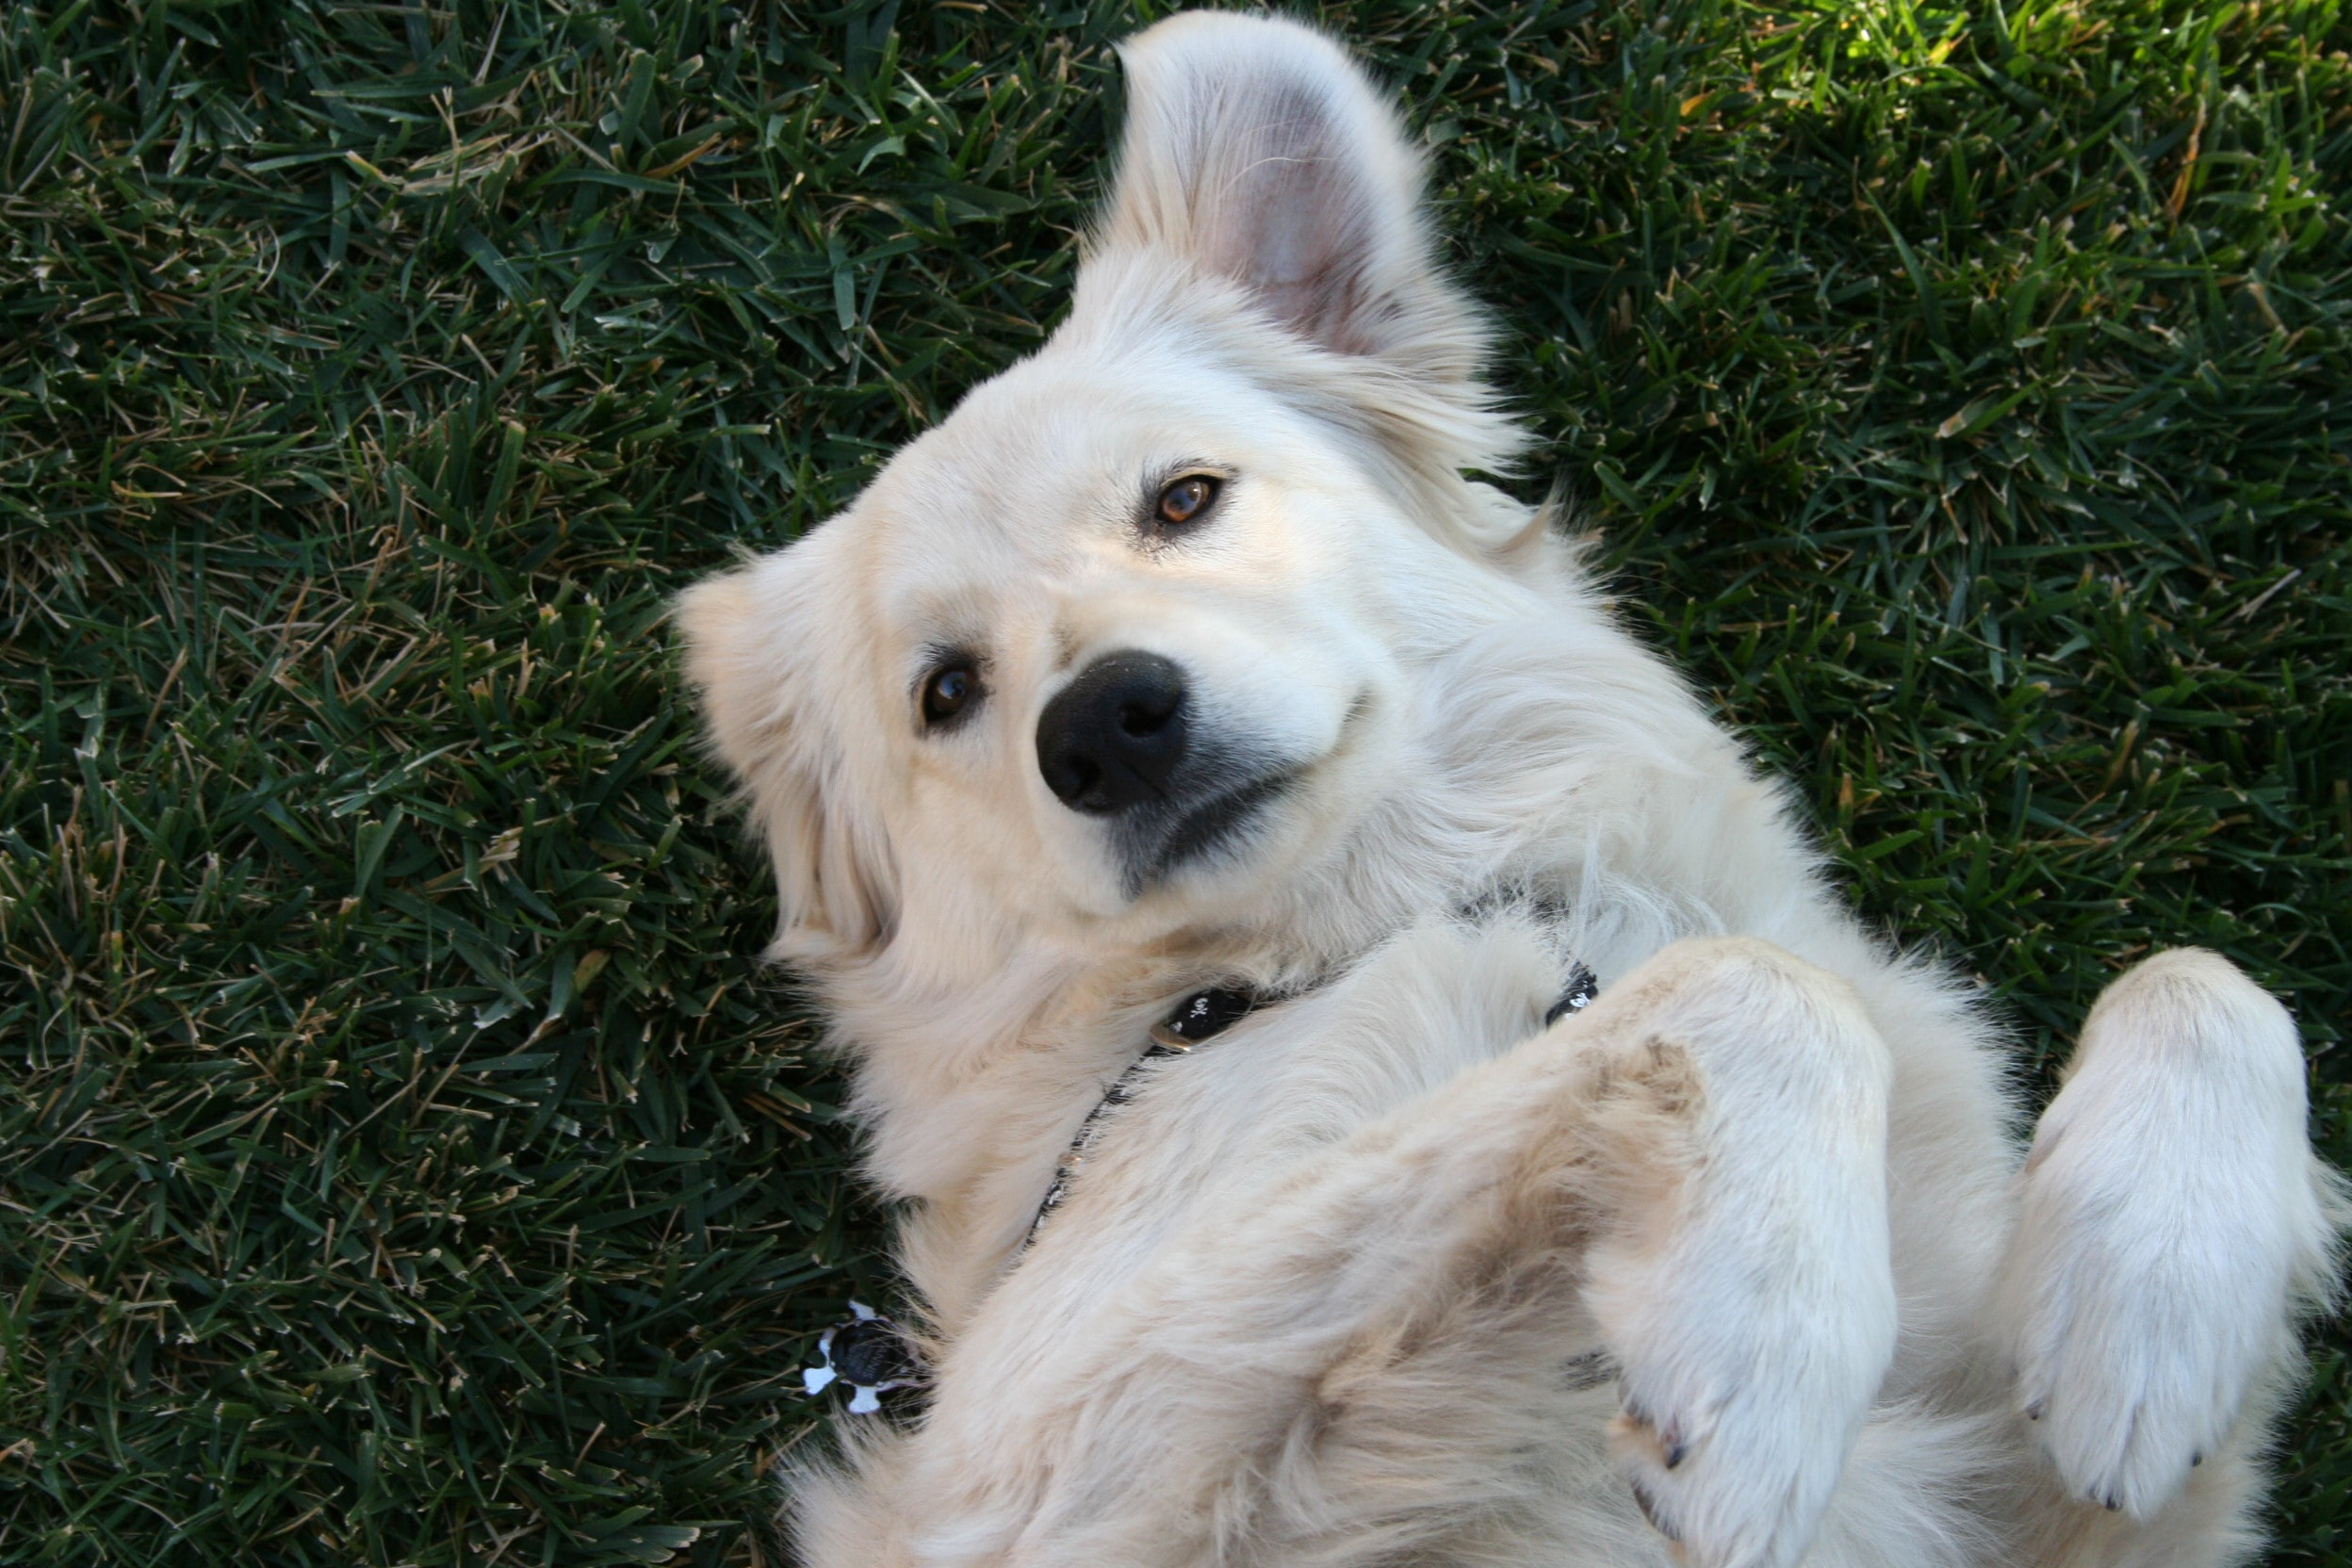 white dog lying on grass field